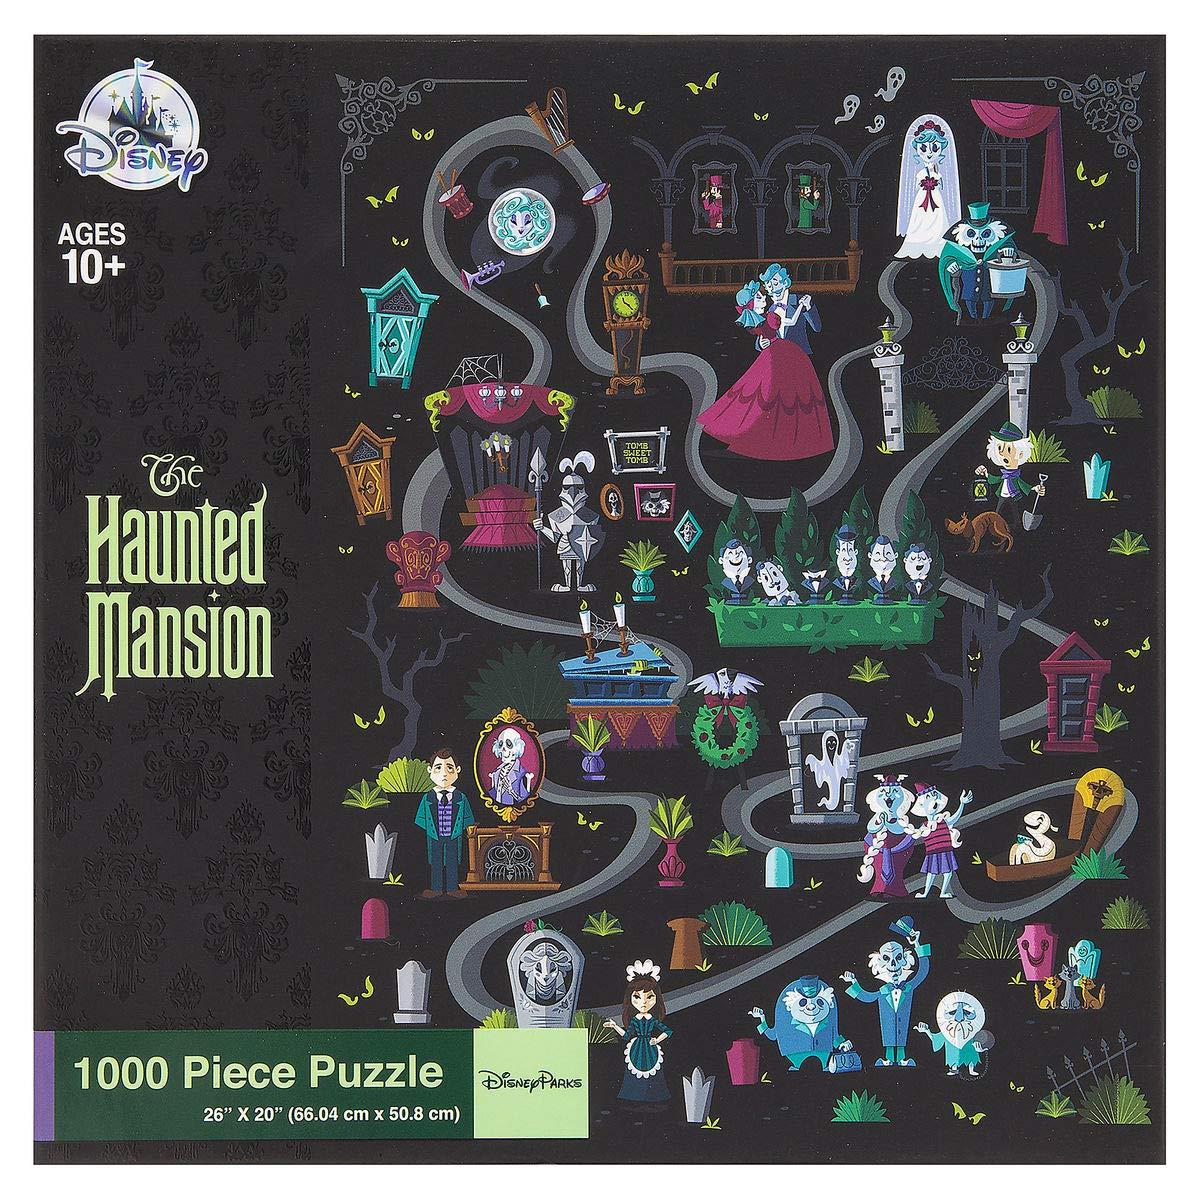 Amazon.com: Disney Parks Haunted Mansion Jigsaw Puzzle ...